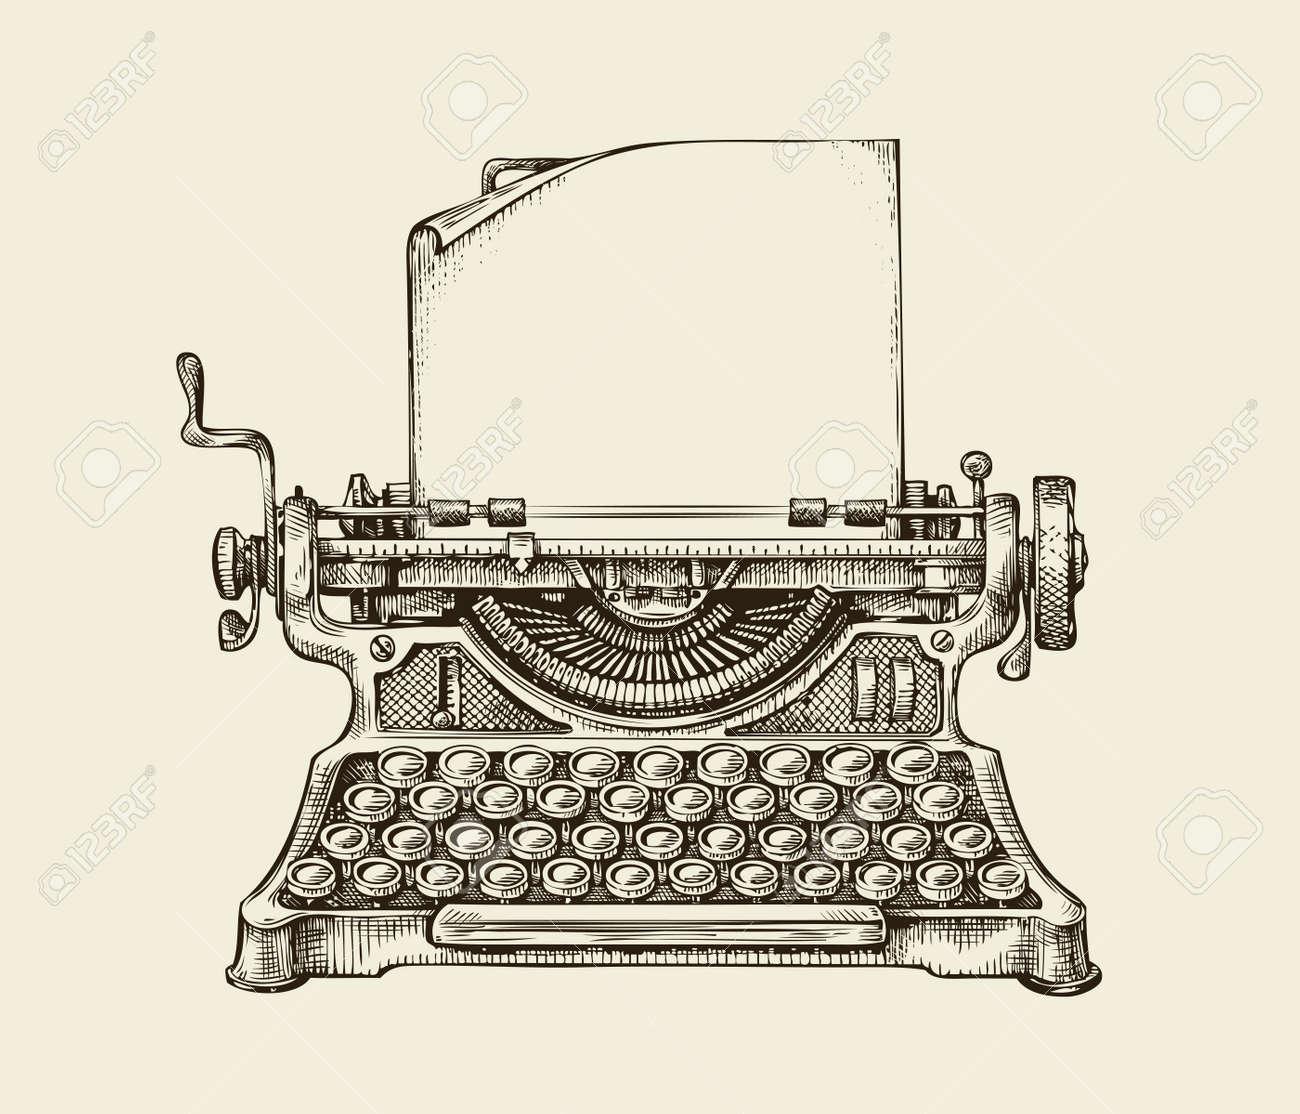 Hand-drawn vintage typewriter. Sketch publishing. Vector illustration - 61268296